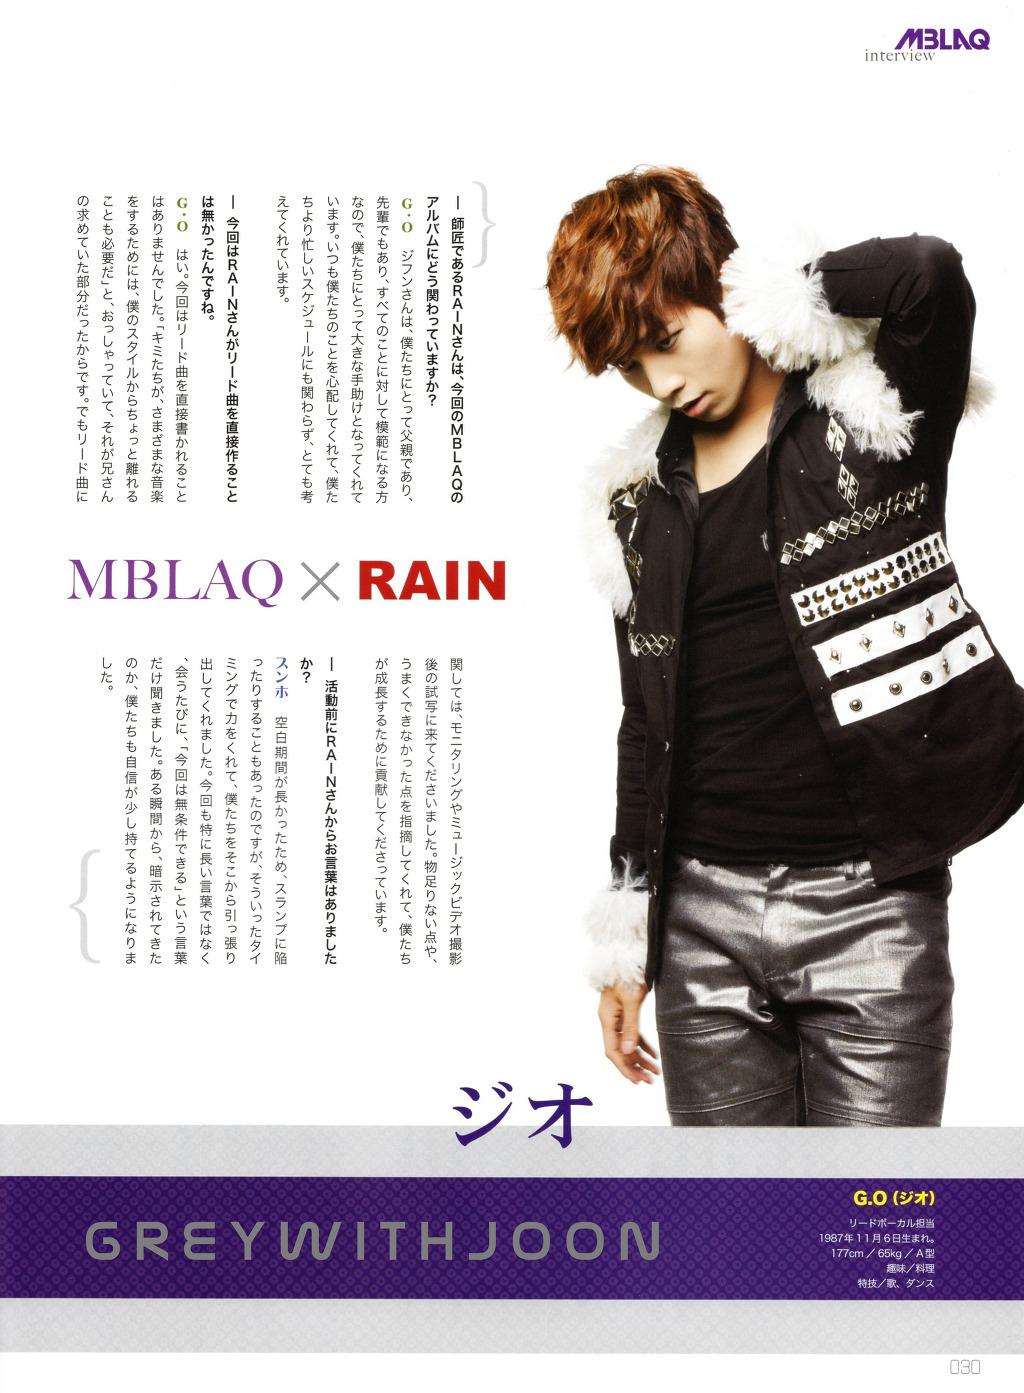 [01.03.11]MBLAQ @ CREA STAR Scan9